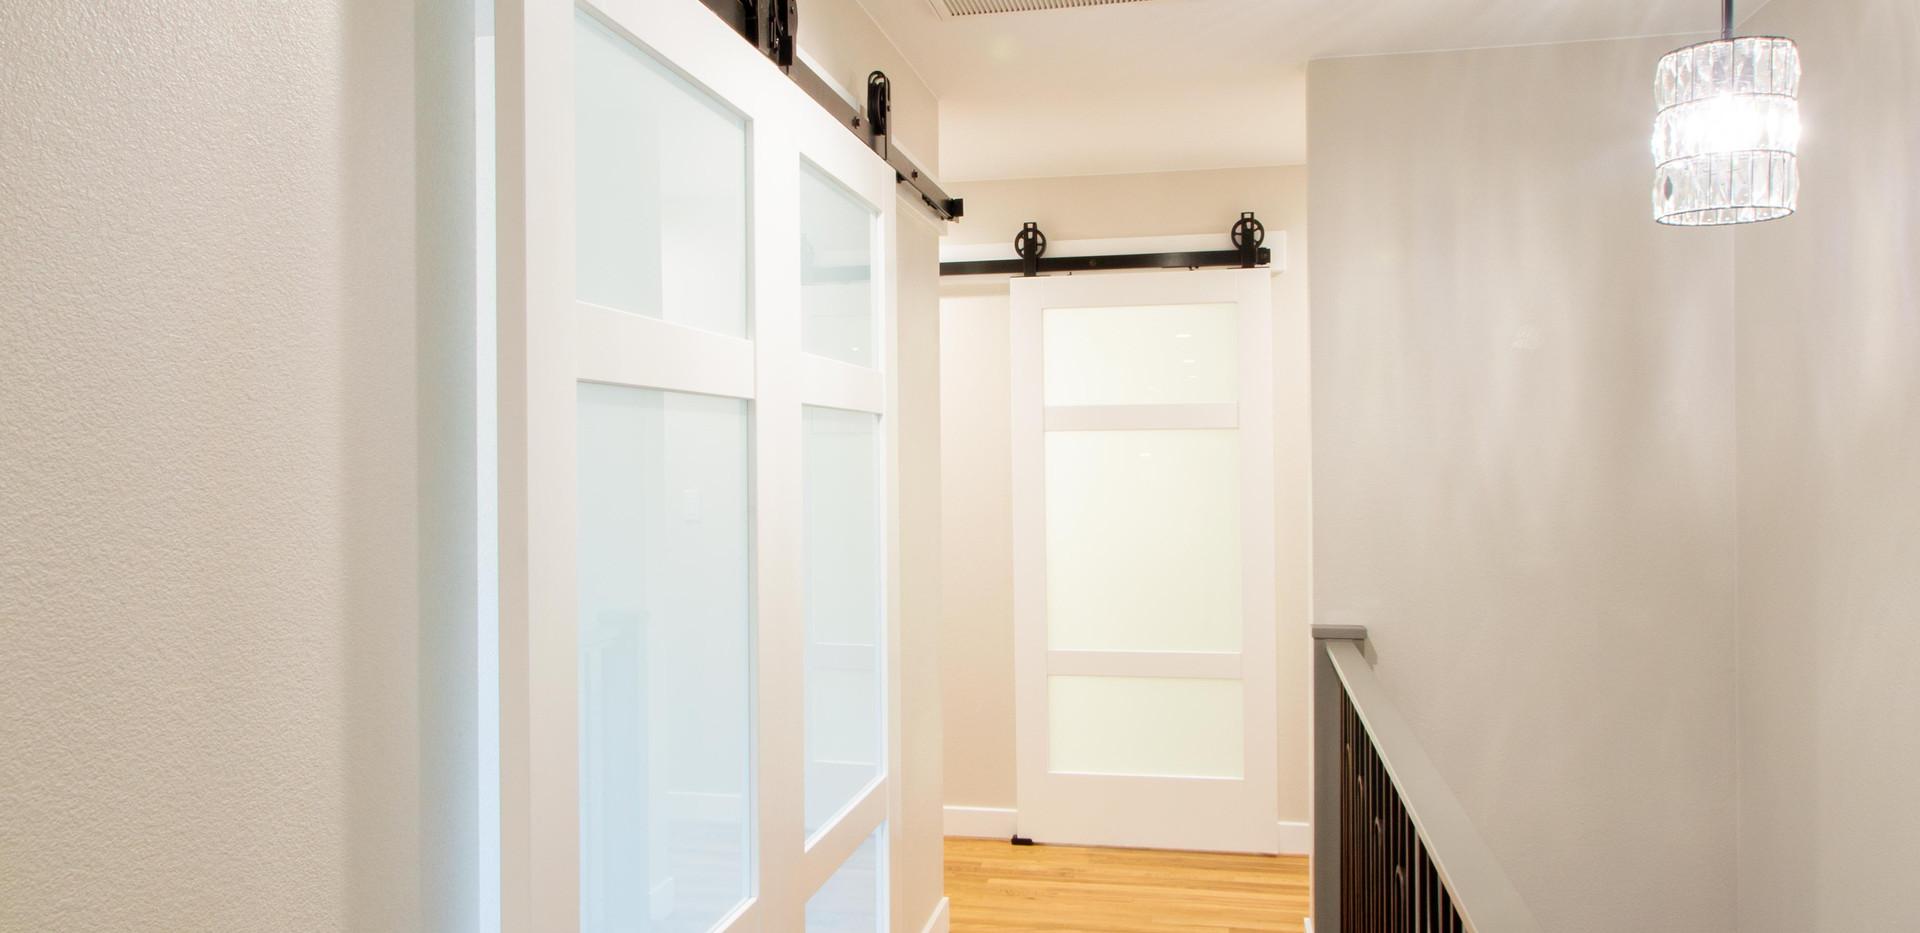 Glass Barn Doors